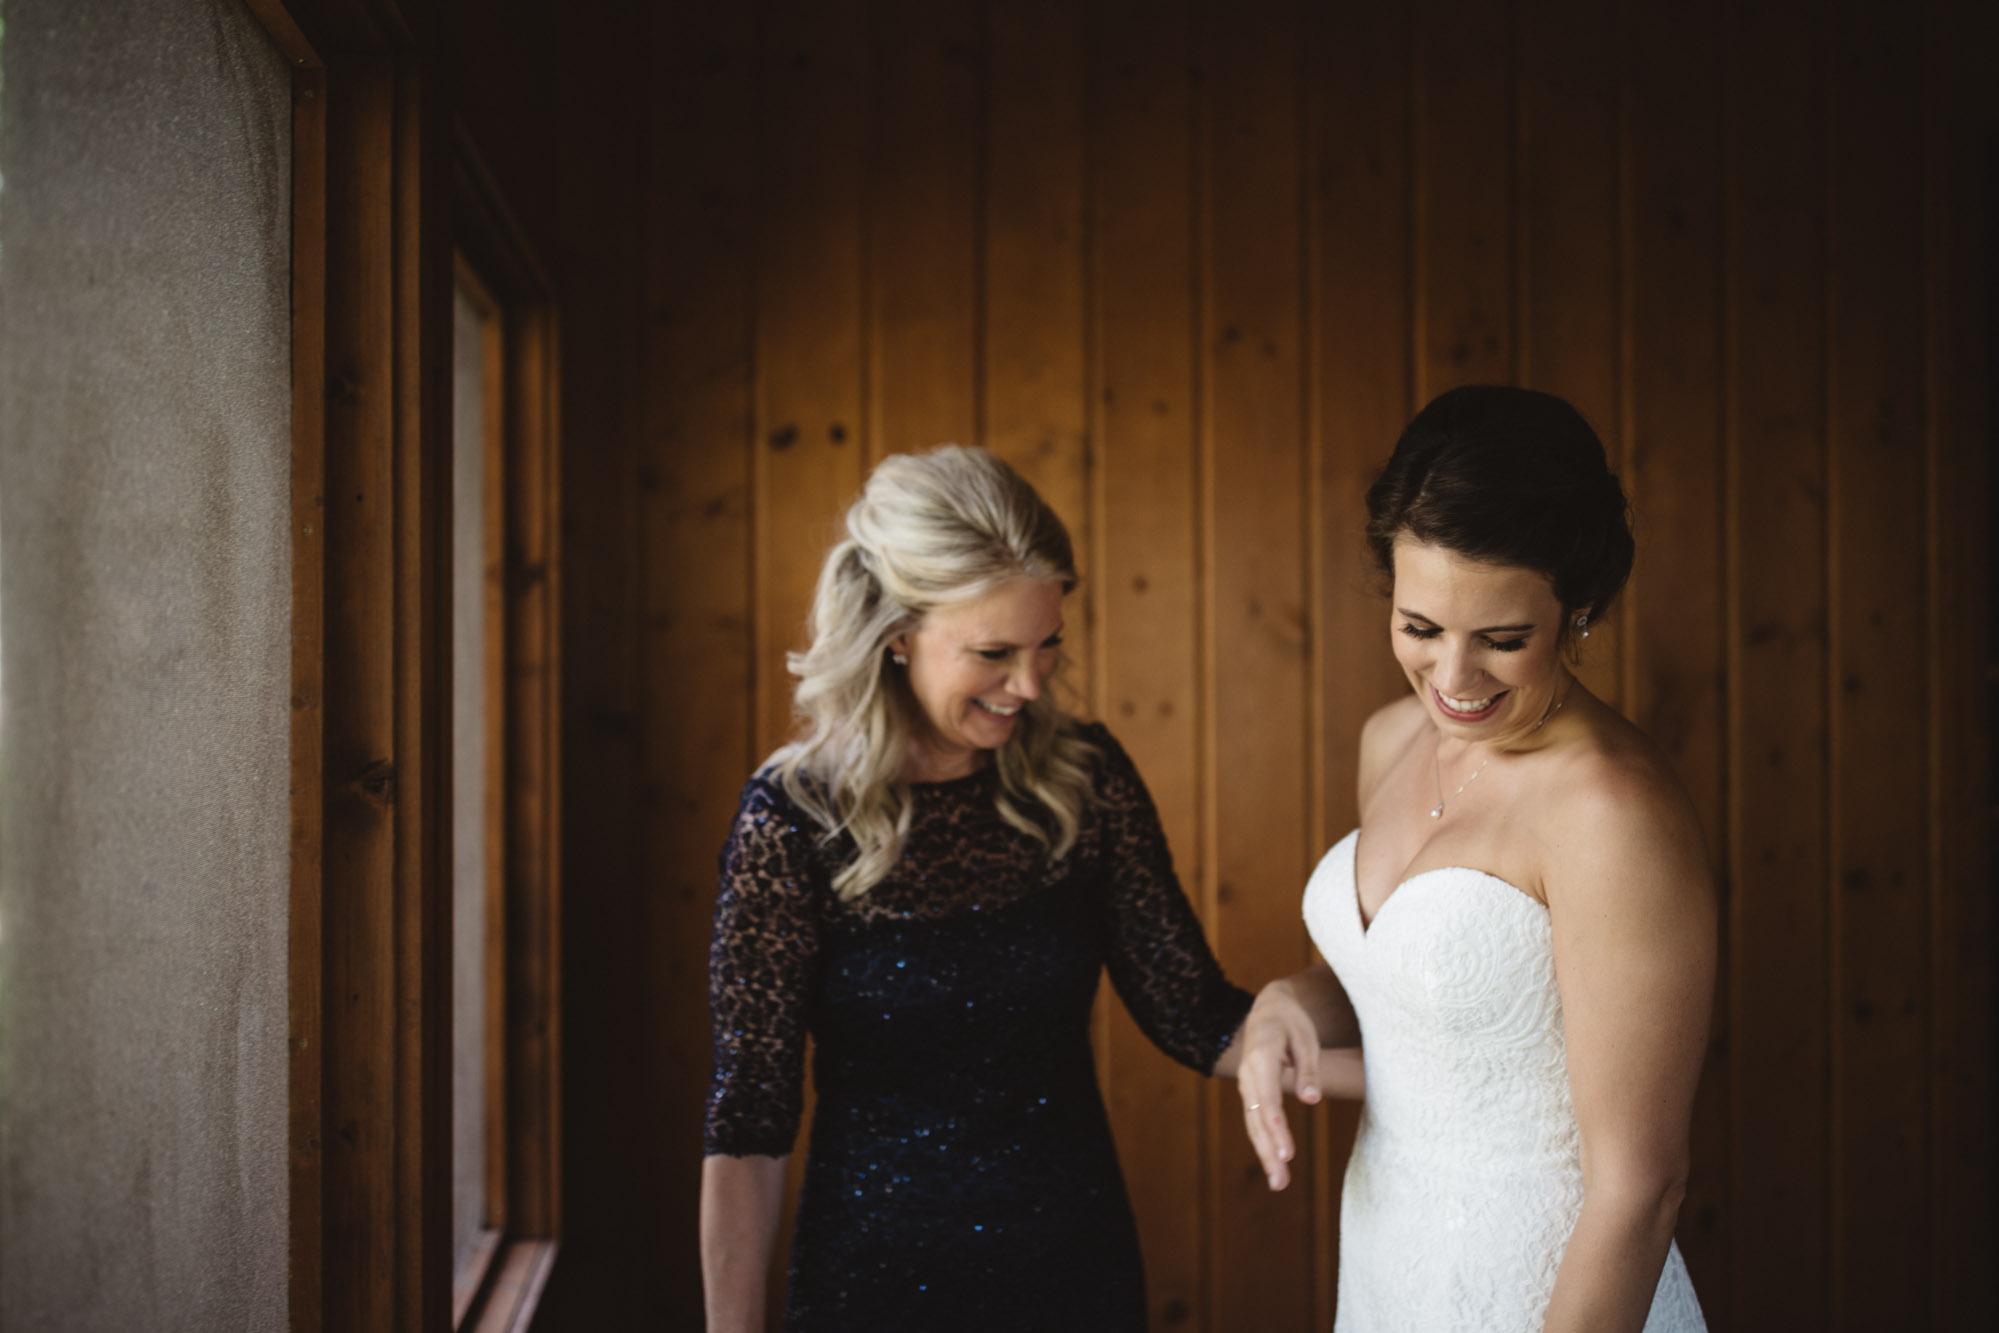 Bride getting ready in northern Minnesota cabin at Grand View Lodge. Photography by Britt DeZeeuw, Brainerd wedding photographer.